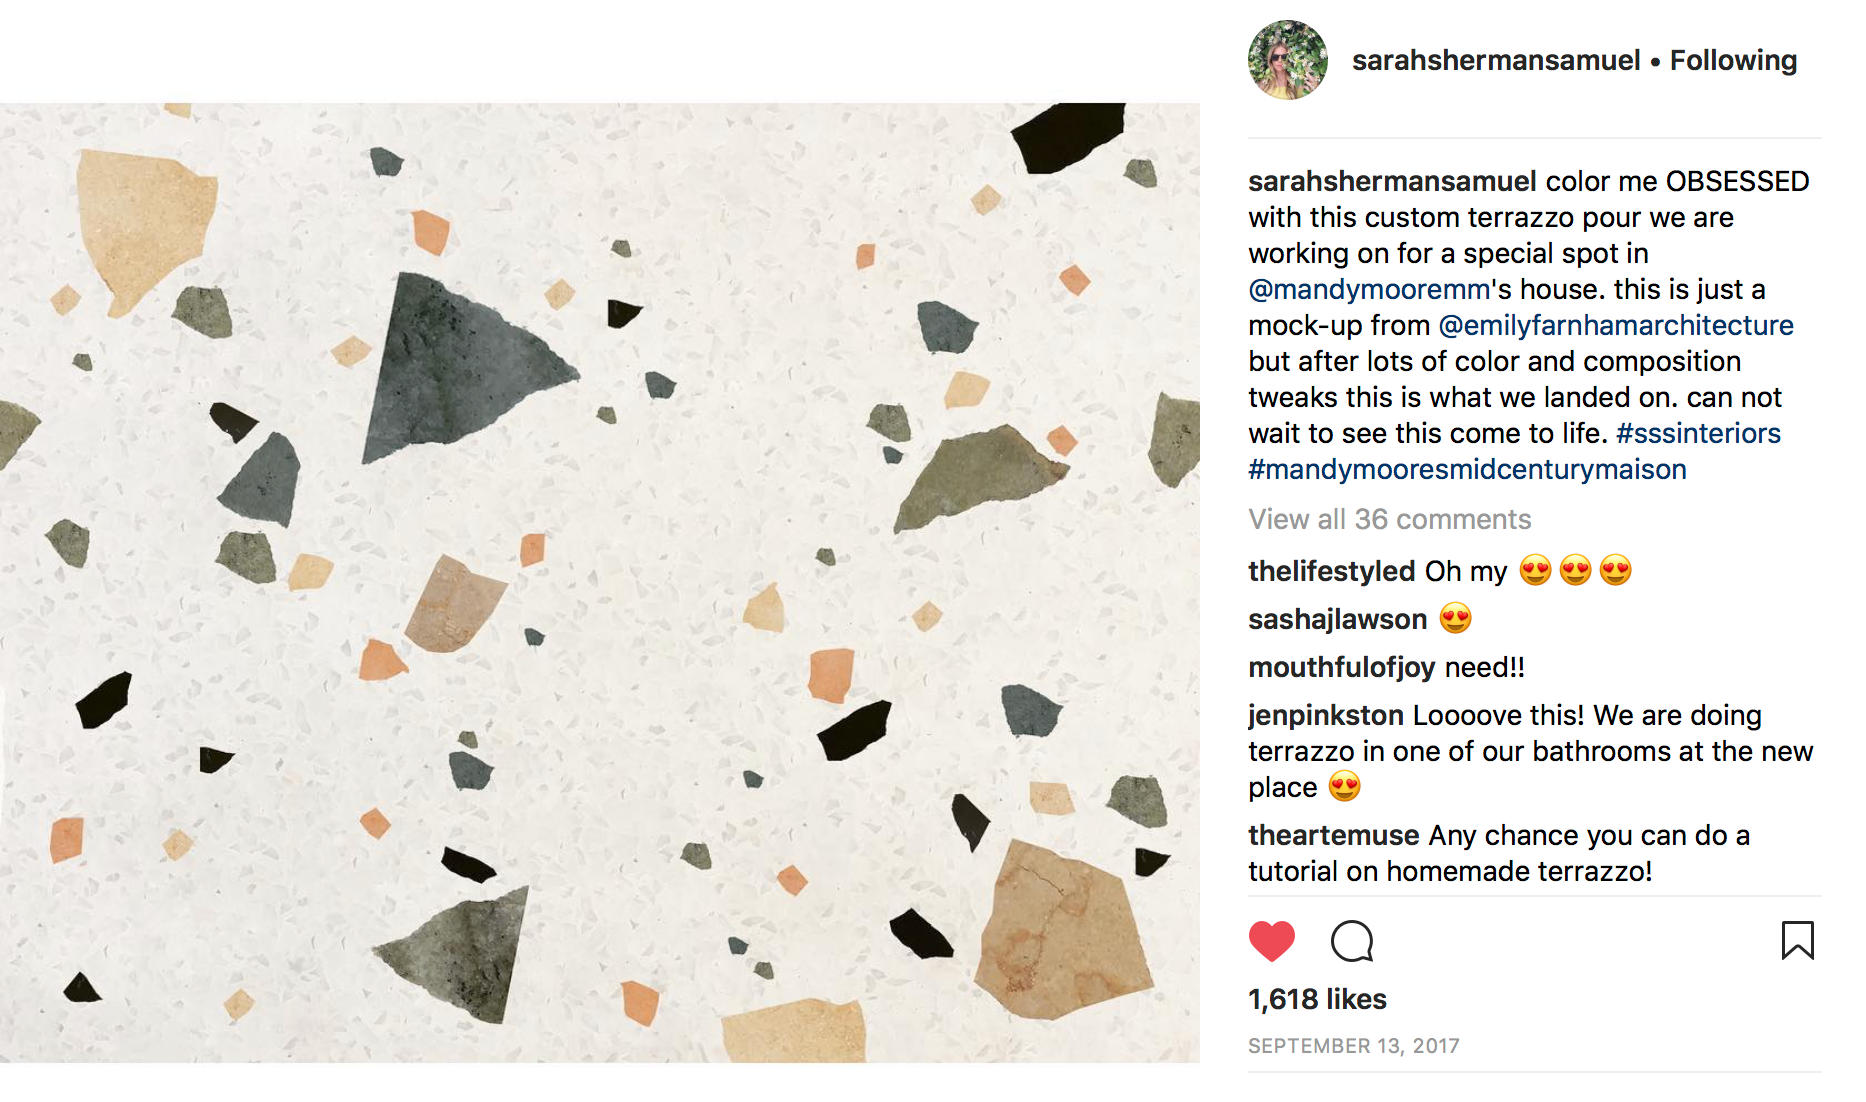 Sarah Sherman Samuel | Instagram Image